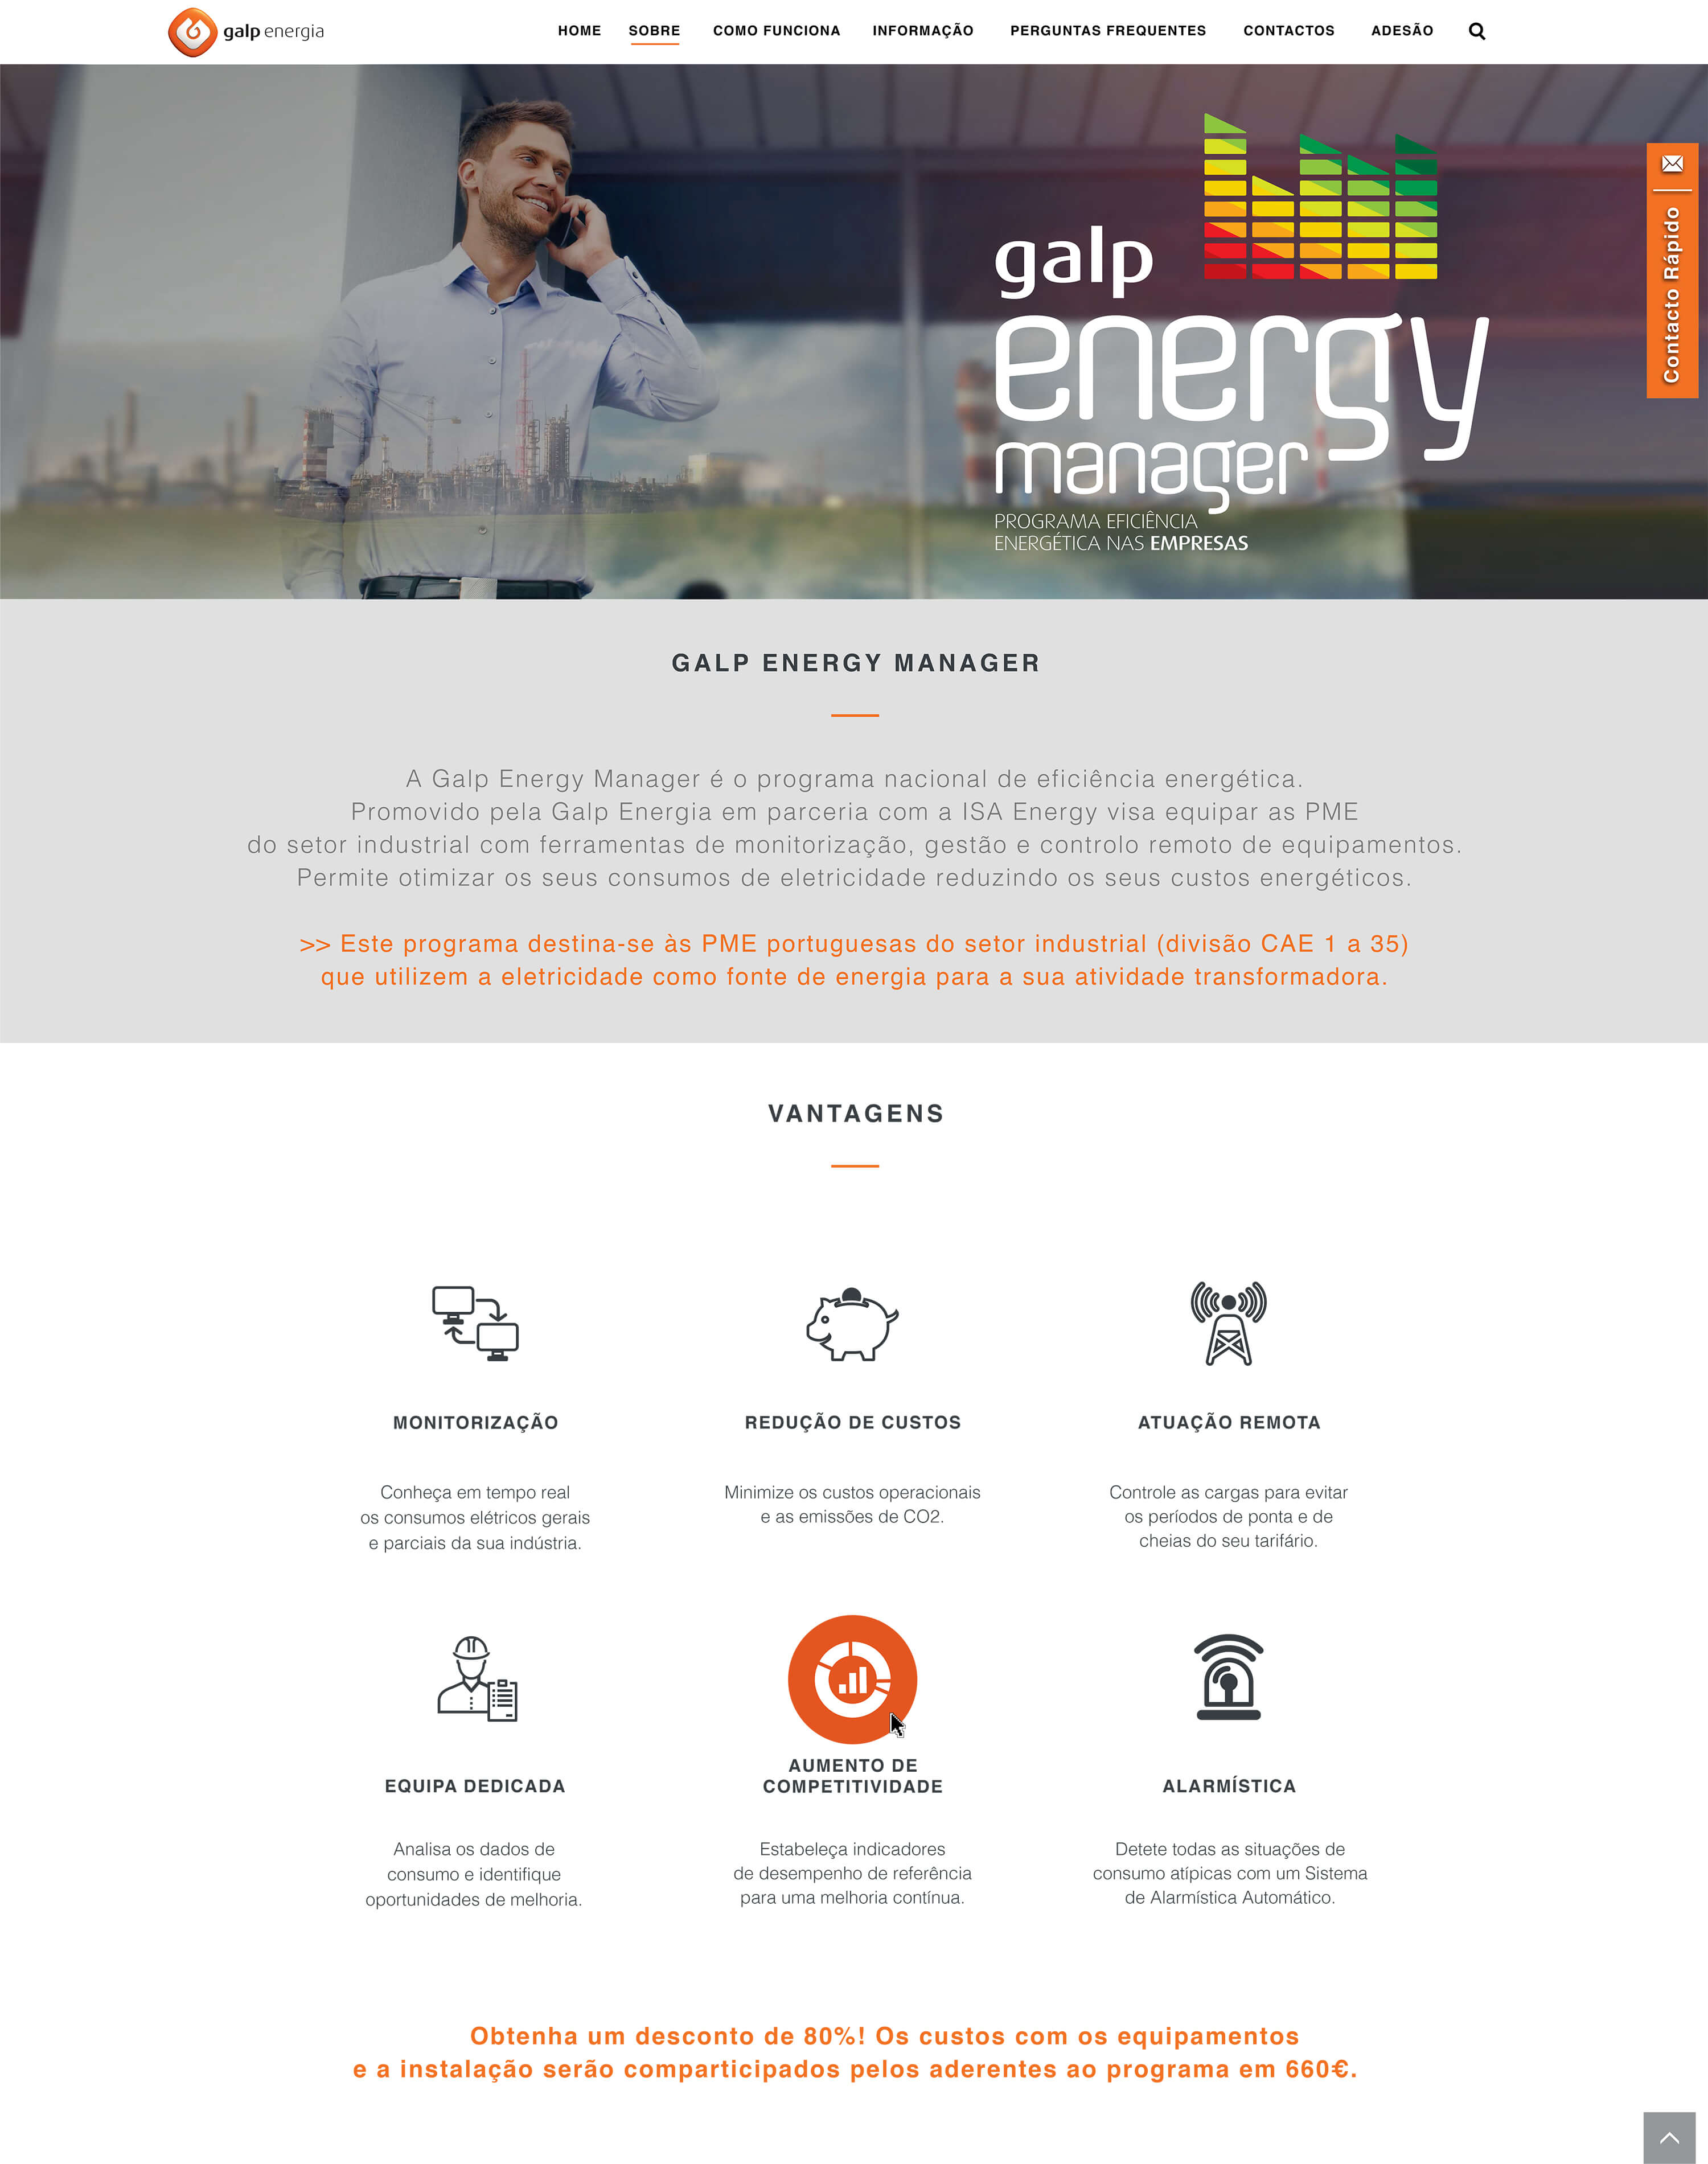 Galp Energy Manager - Inner Page | Luis Serra Freelancer